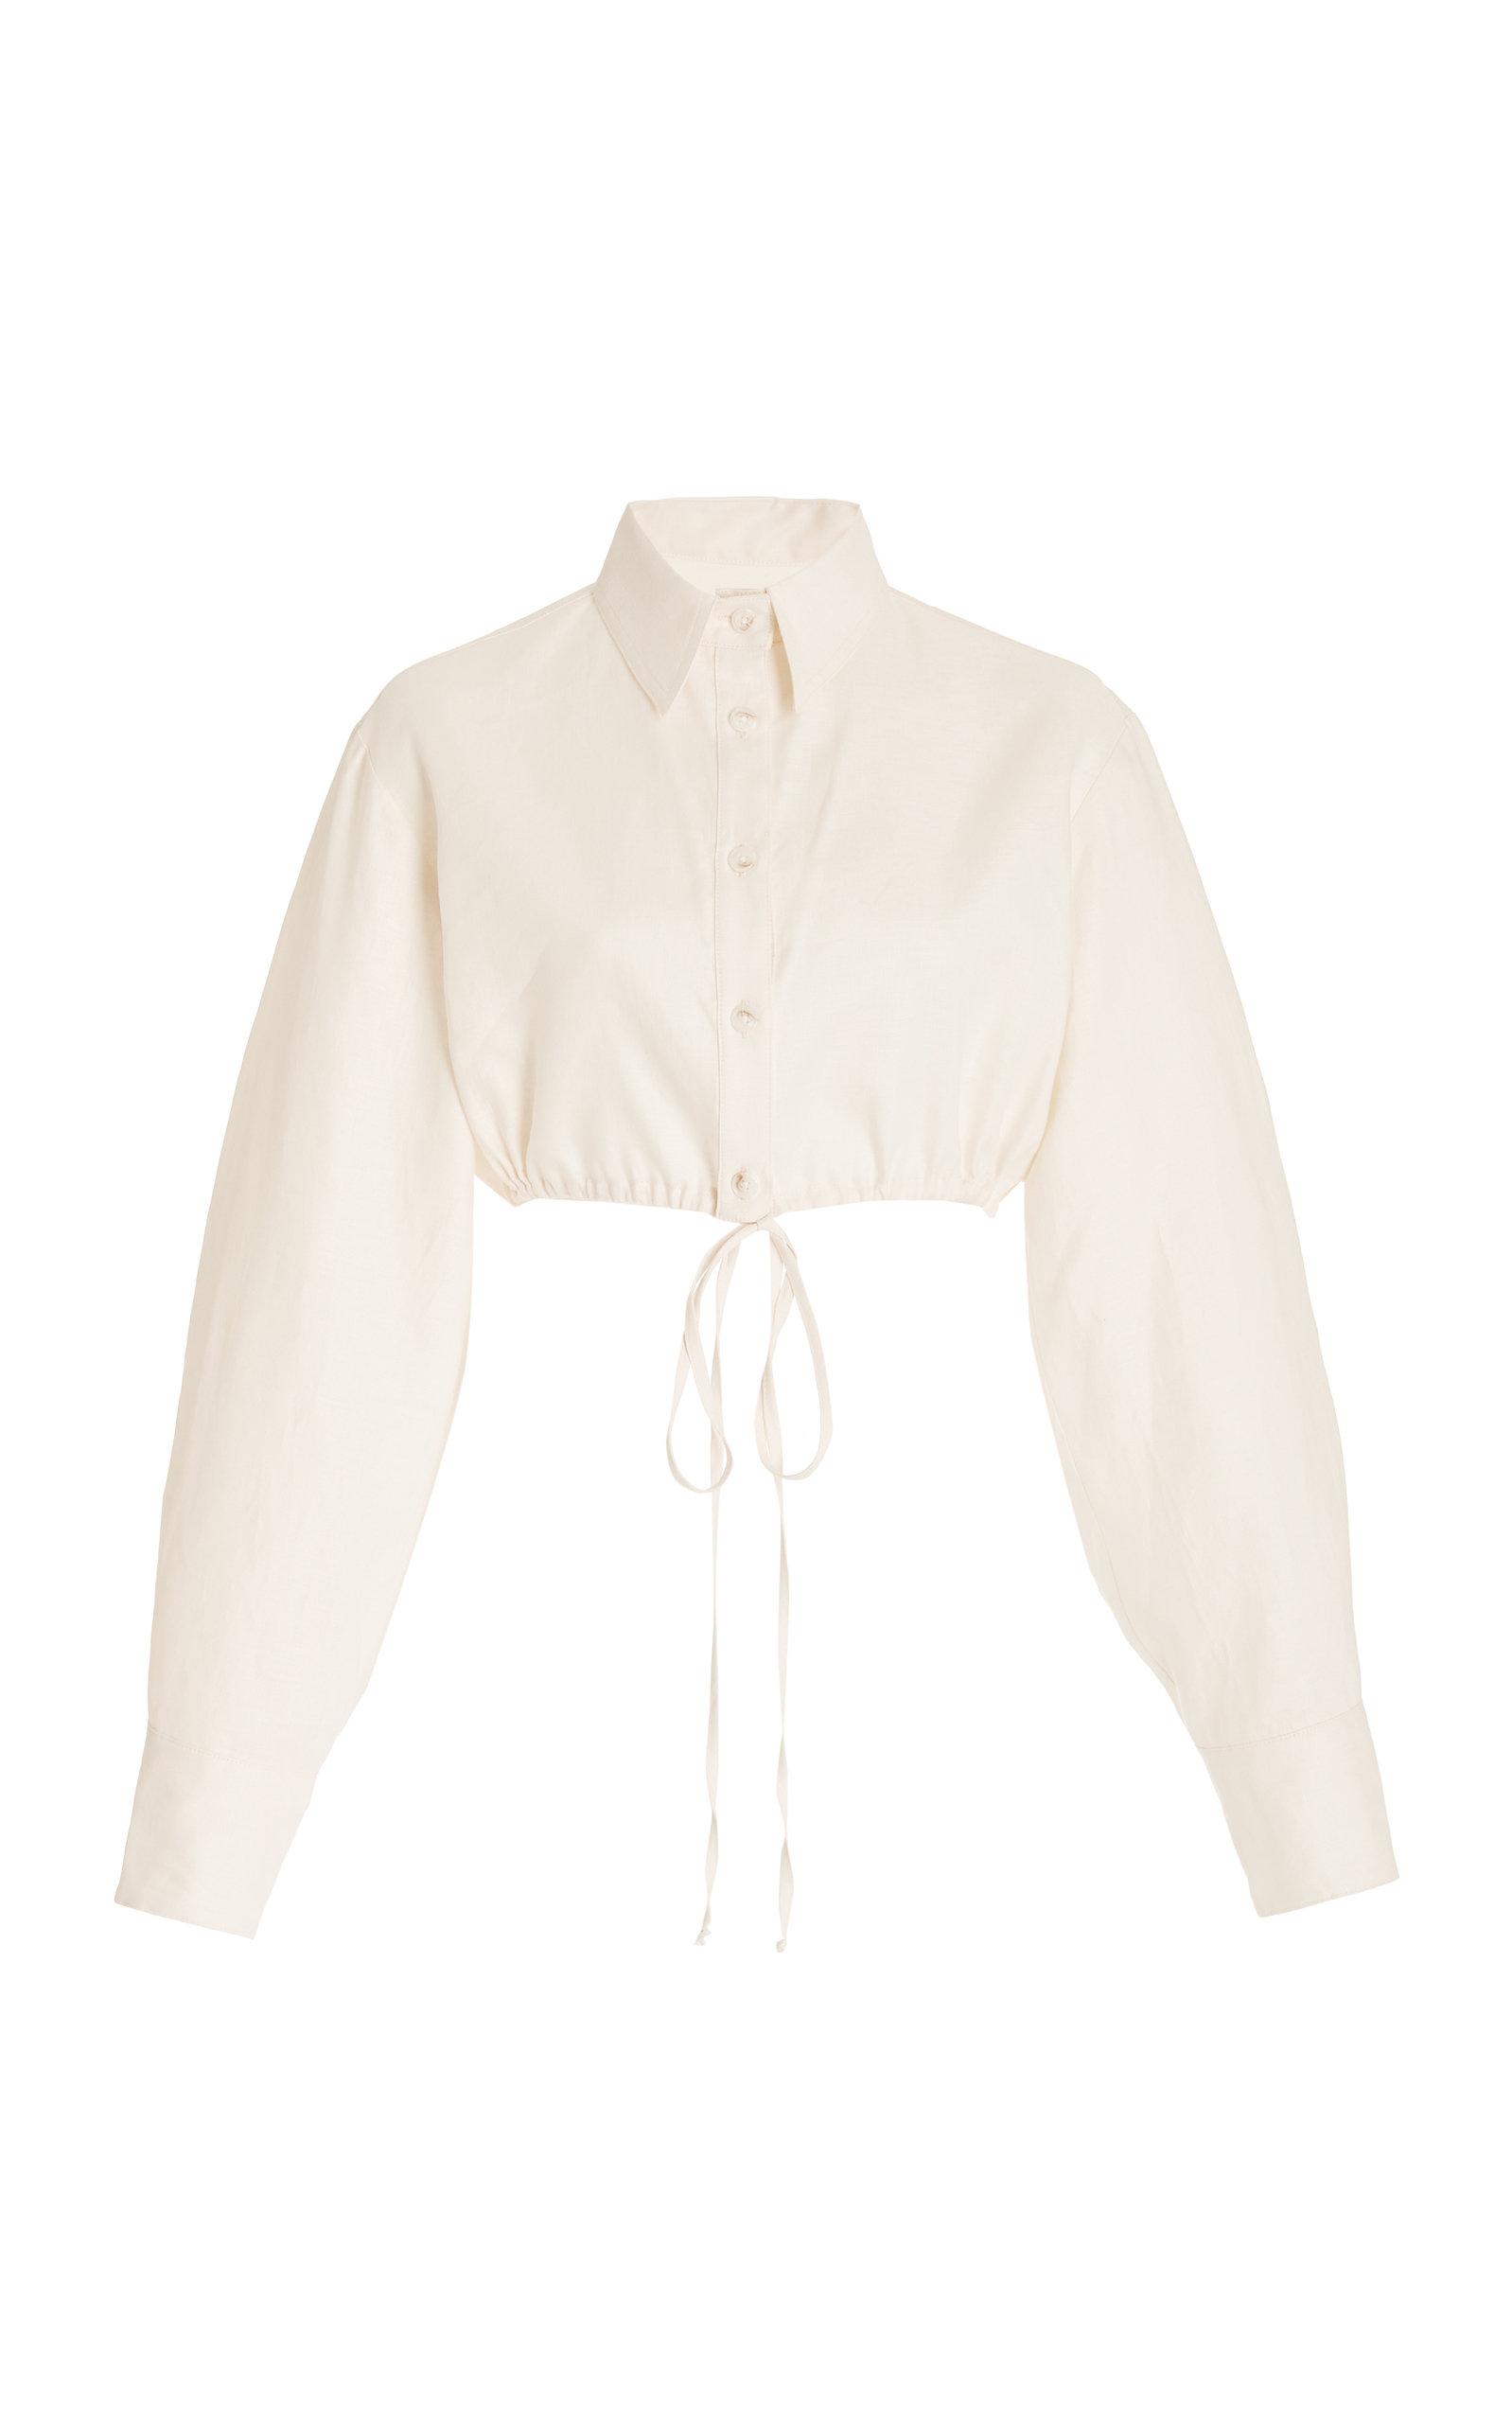 Women's Exclusive Cropped Linen Shirt